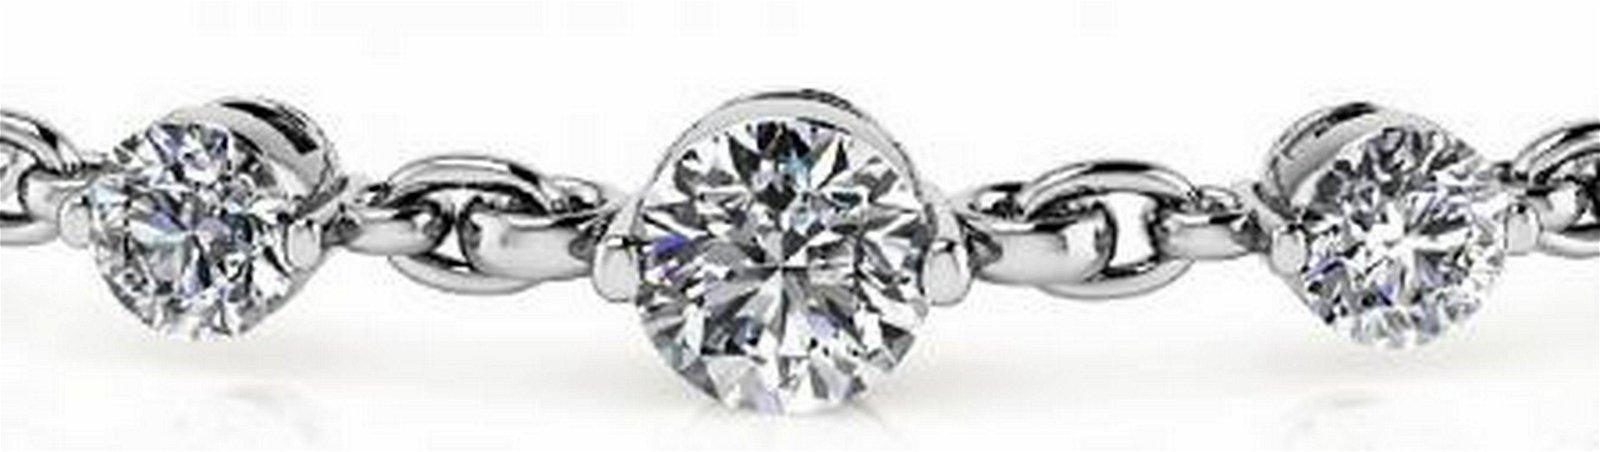 14K WHITE GOLD 5 CTW G-H I1/I2 DIAMOND AND CHAIN LINK B